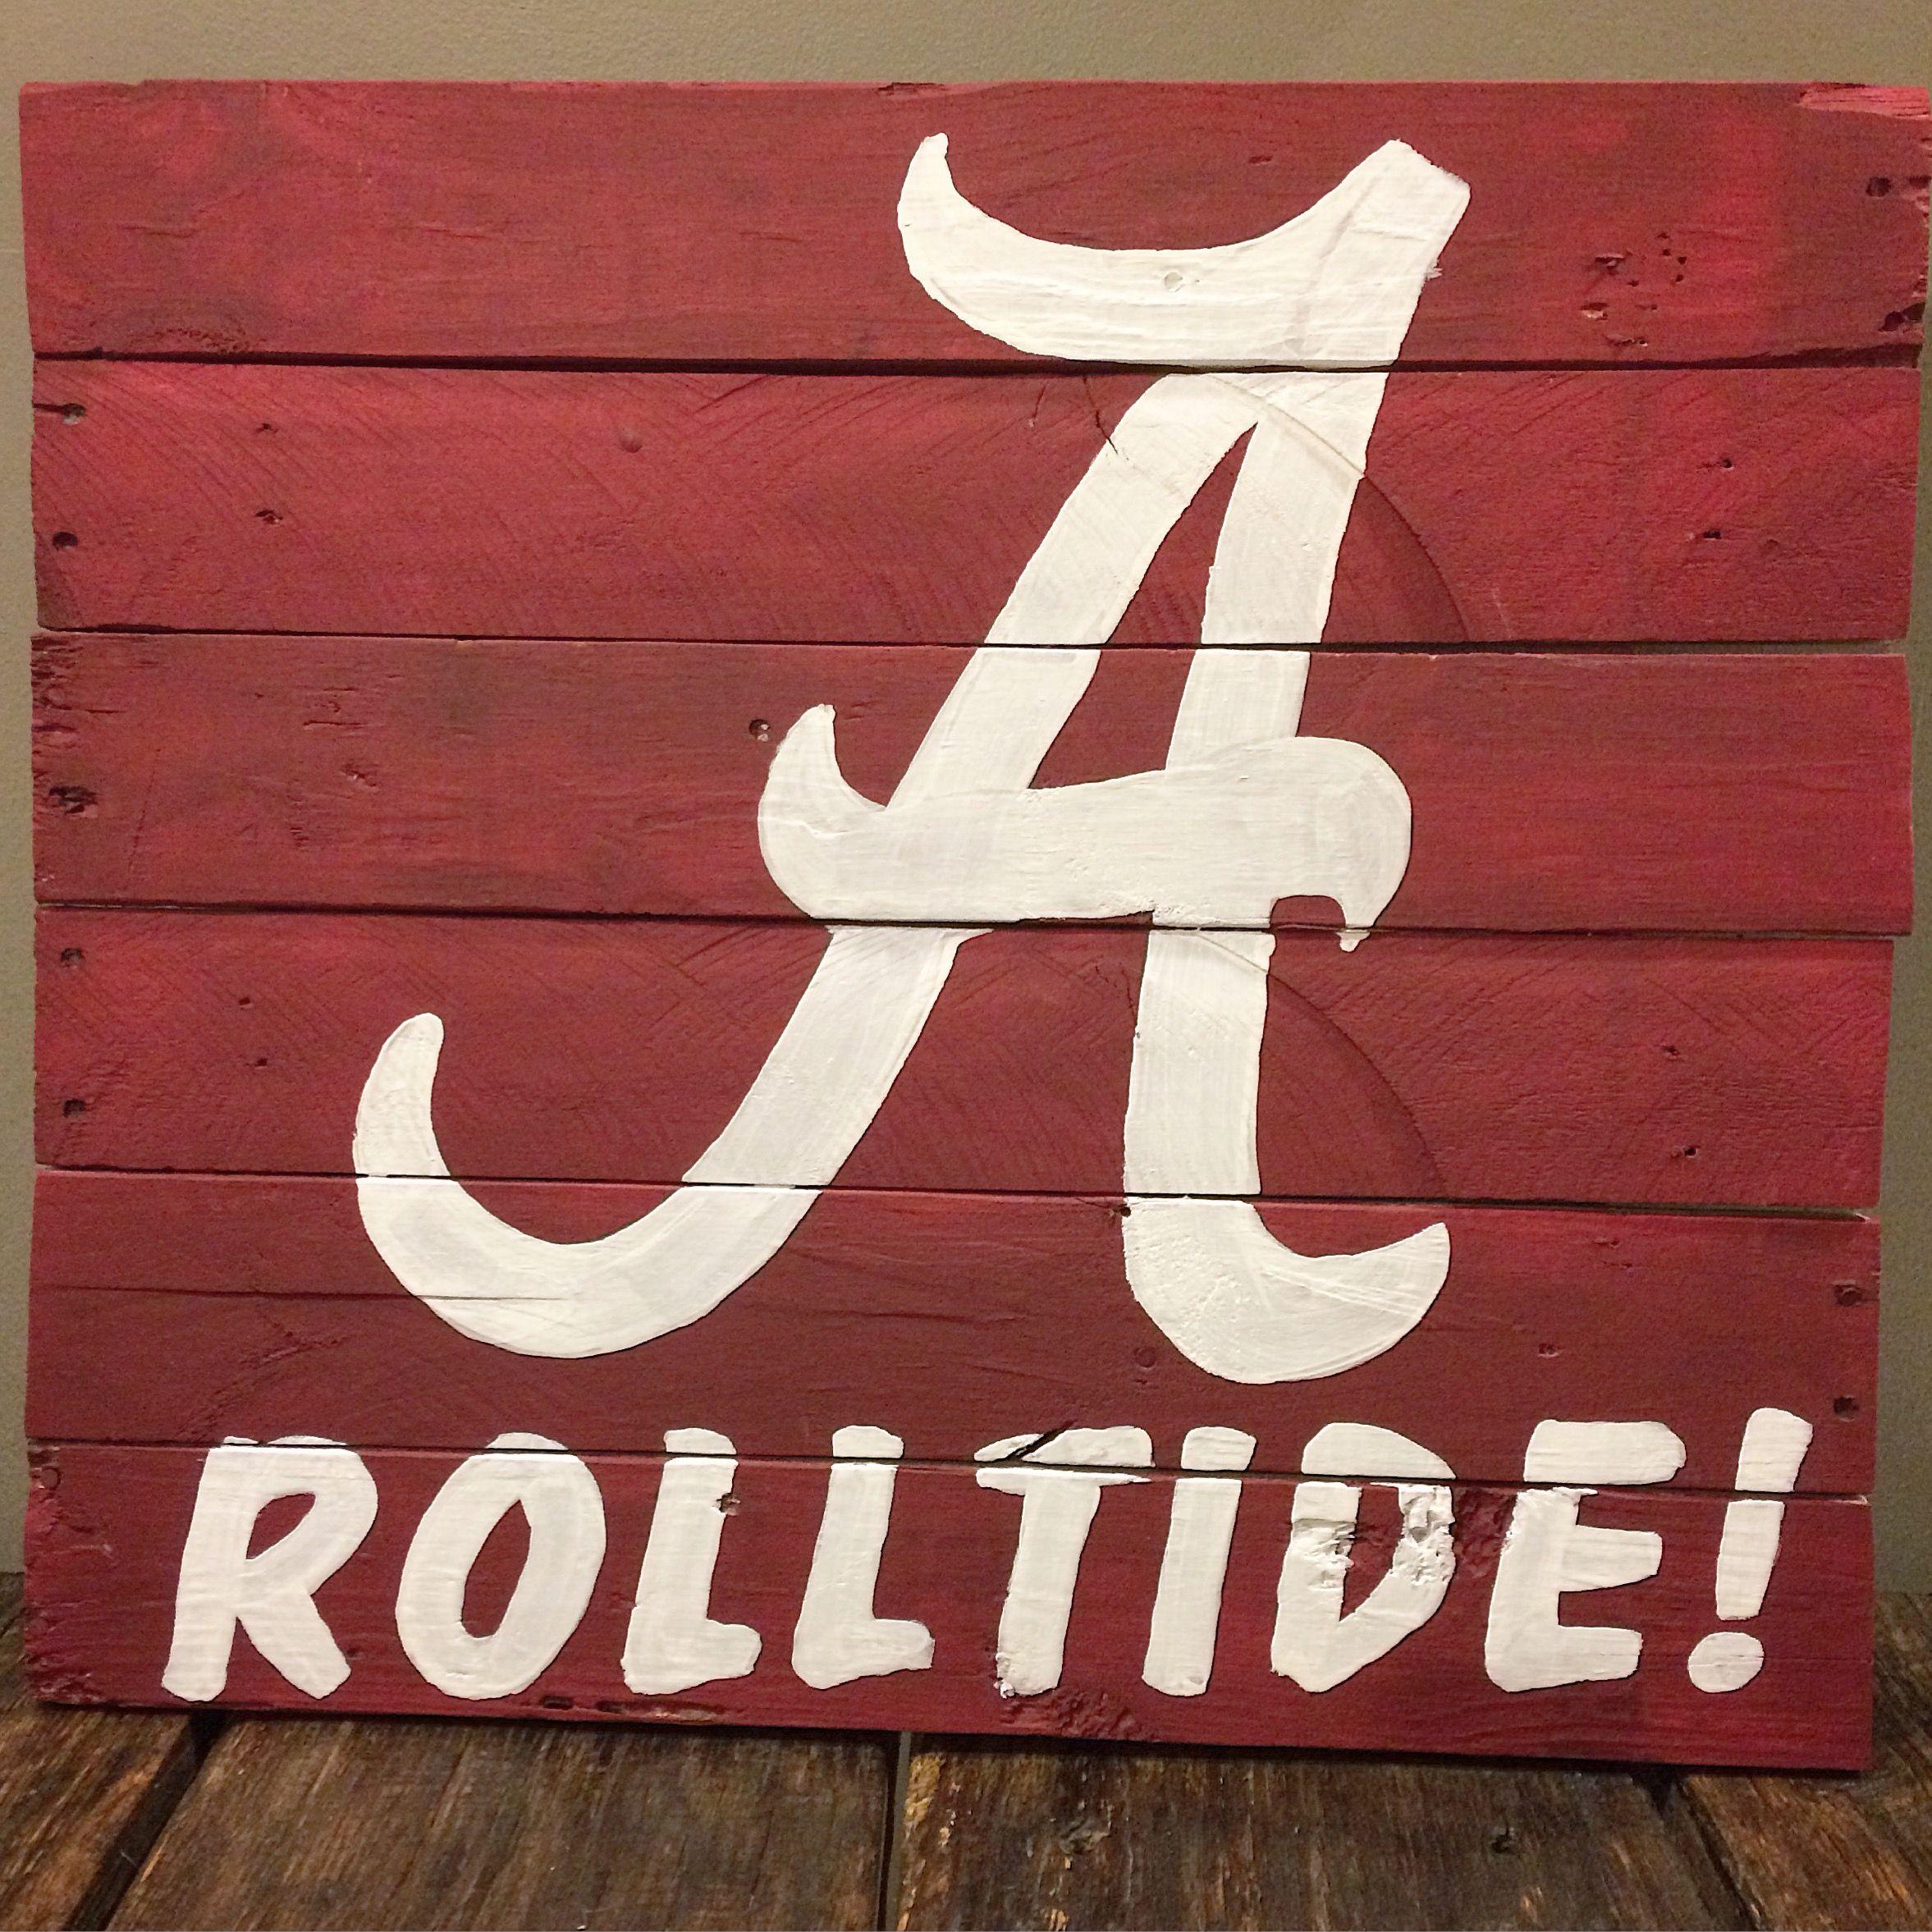 Alabama Crimson Tide Football Roll Tide Reclaimed Wood Sign Alabama Crimson Tide Football Crimson Tide Decor Roll Tide